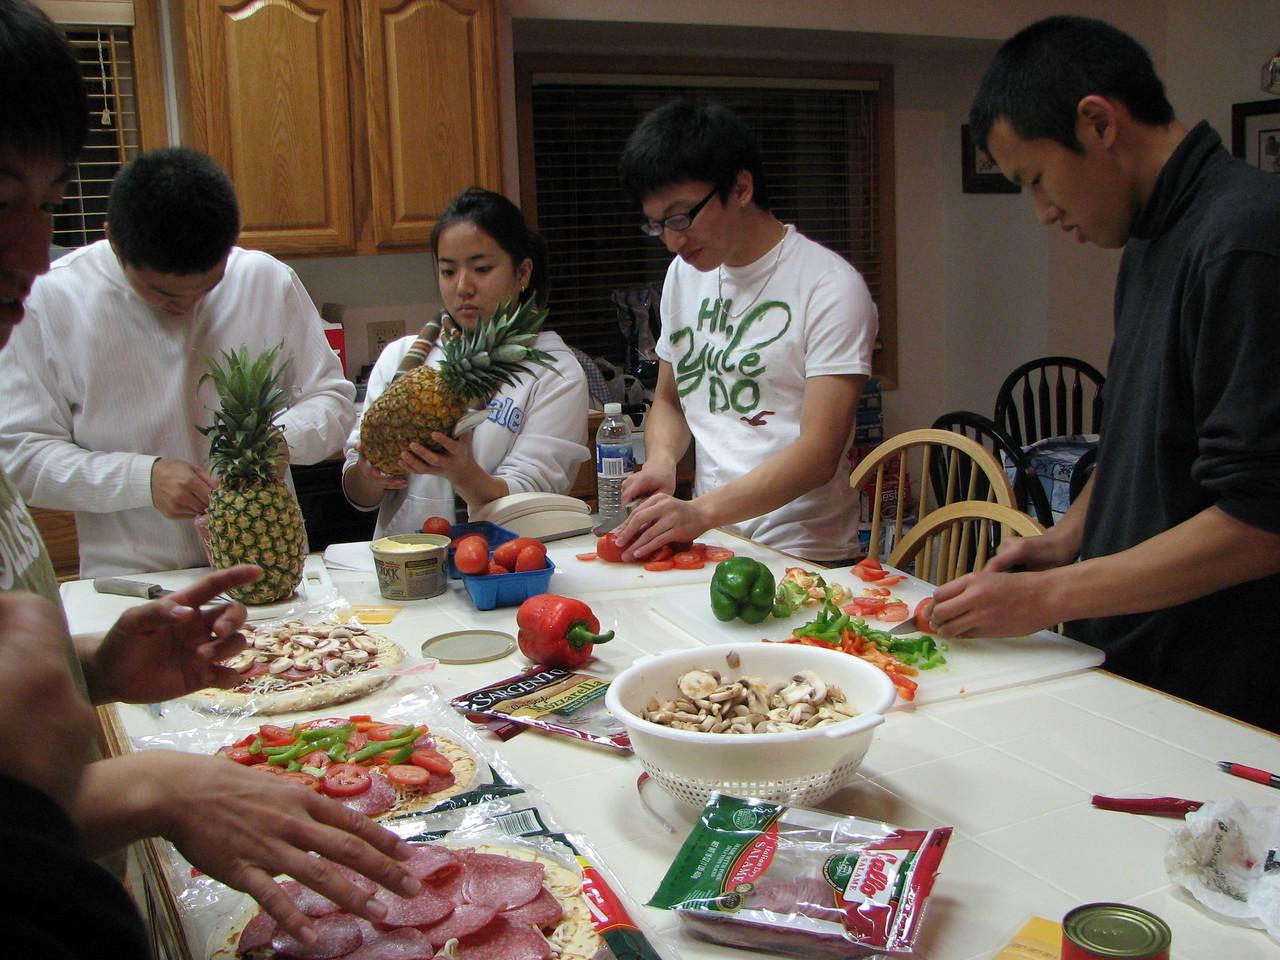 2006 12 21 Thu - Ted Hong, Shinae Kim, Jimmy Lee, & Doug Kang preparing pizzas